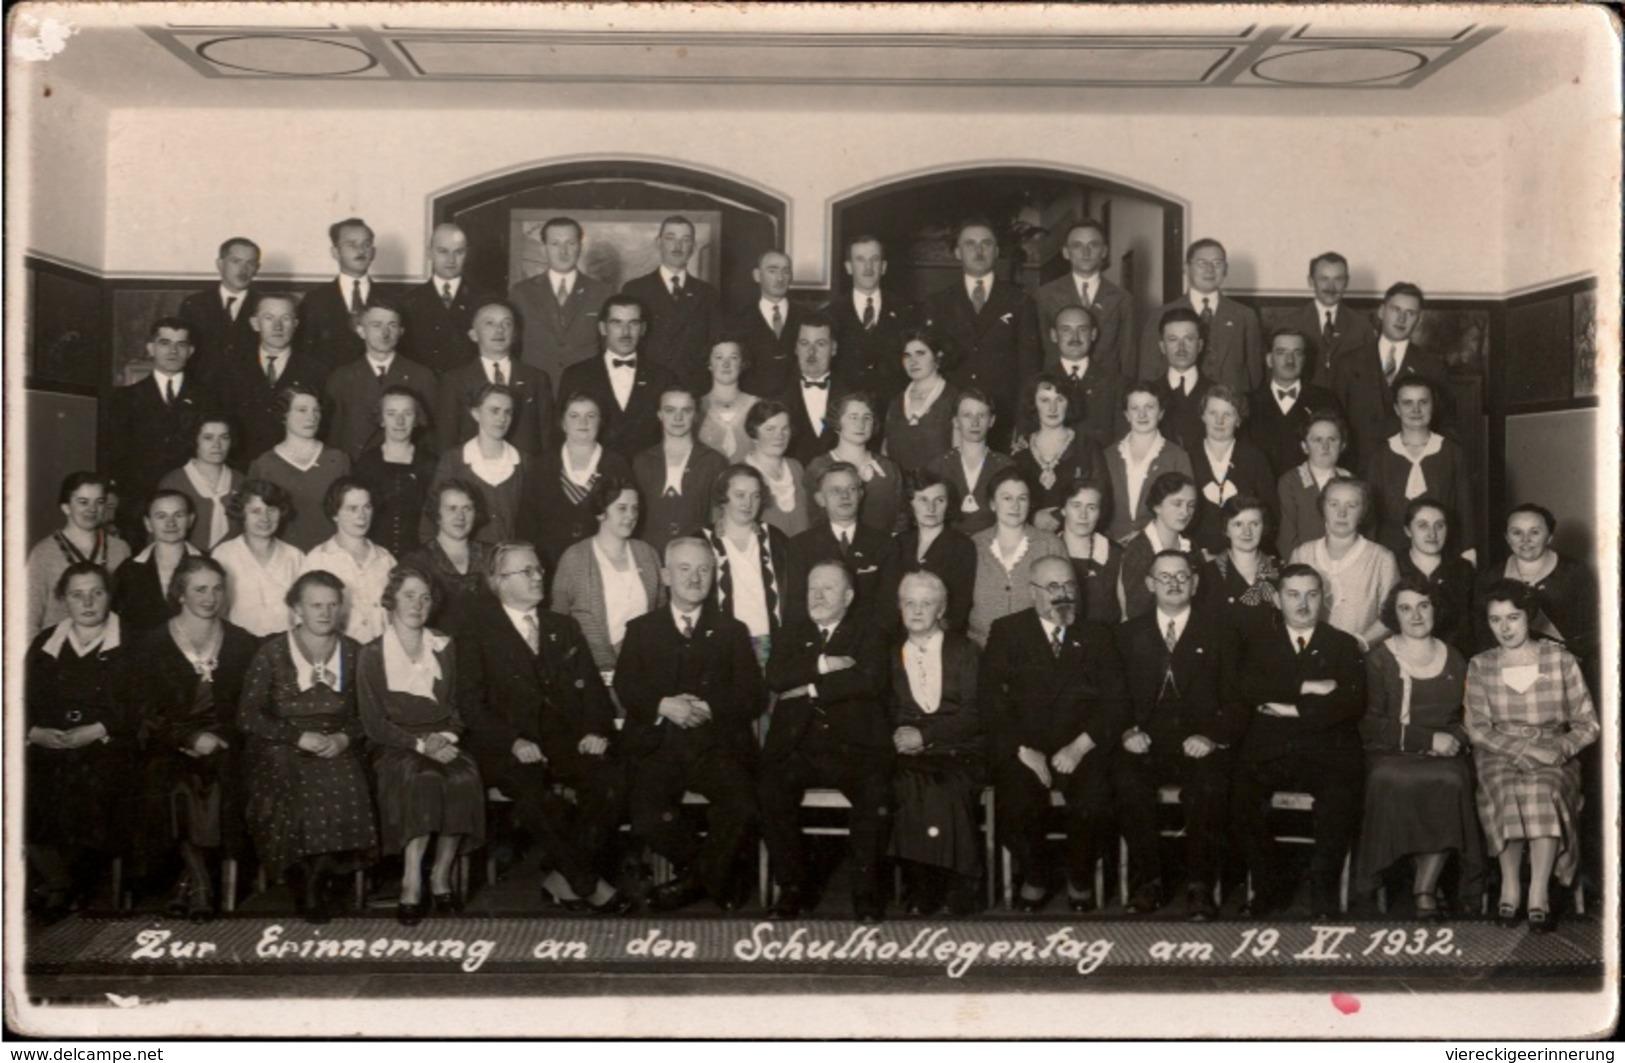 ! Seltene Fotokarte , Photo, Rumburk, 1932 Schulkollegentag, Photographenstempel Oberhennersdorf, Sudetenland - Sudeten